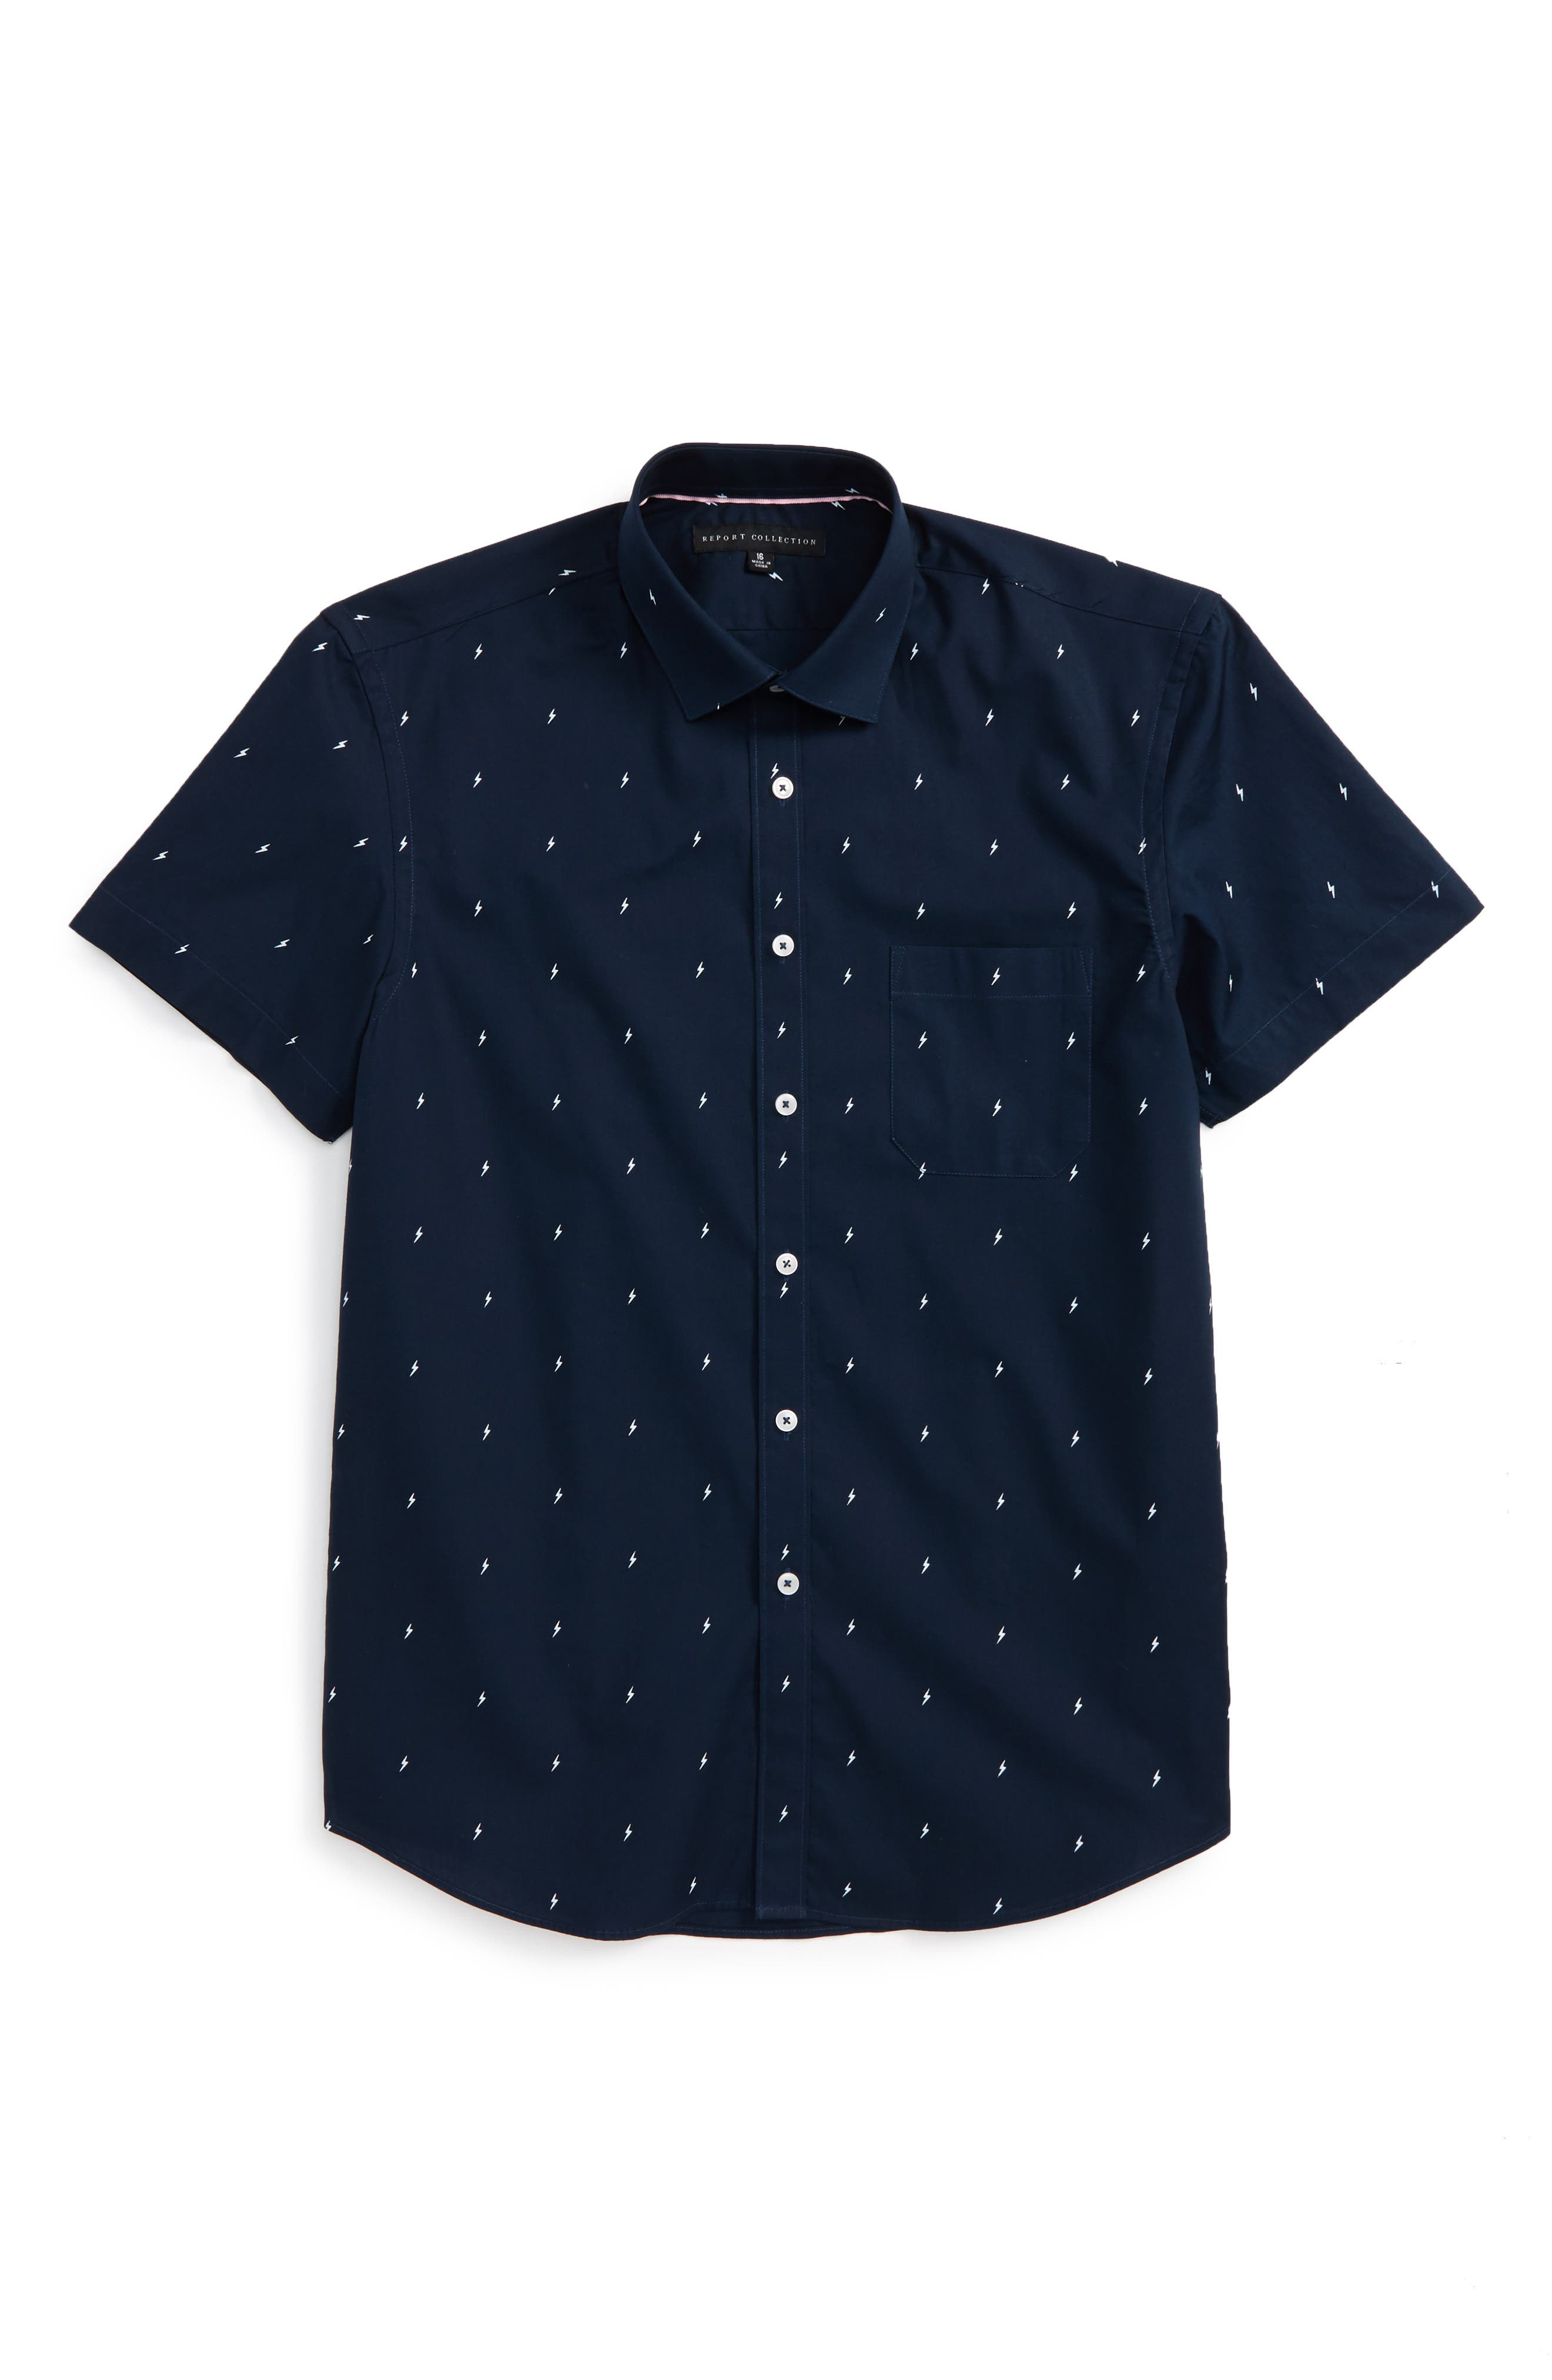 Main Image - Report Collection Lightning Bolt Dress Shirt